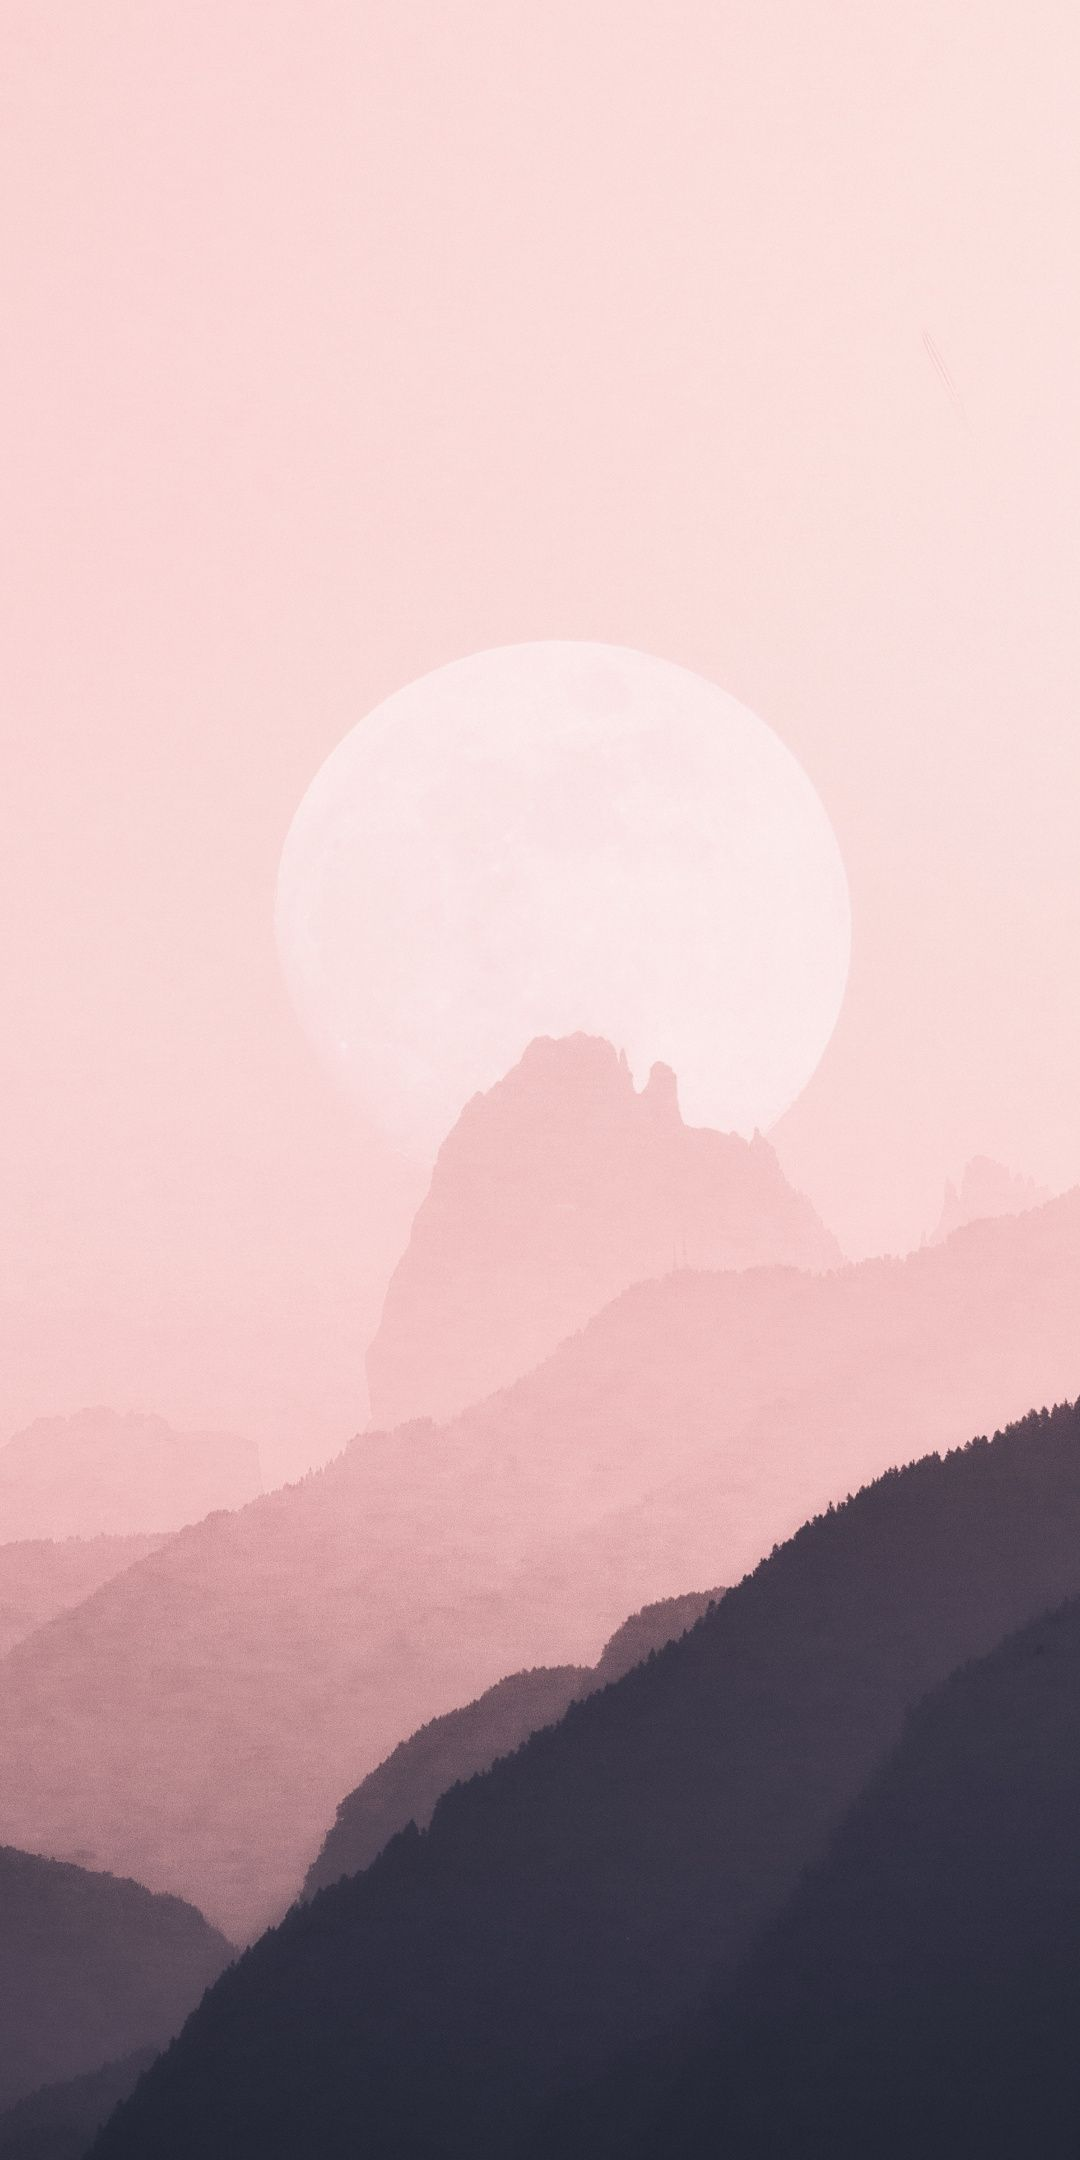 1080x2160 Minimal Horizon Nature Mountains Silhouette Wallpaper Iphone Wallpaper Mountains Minimal Wallpaper Ipad Pro Wallpaper